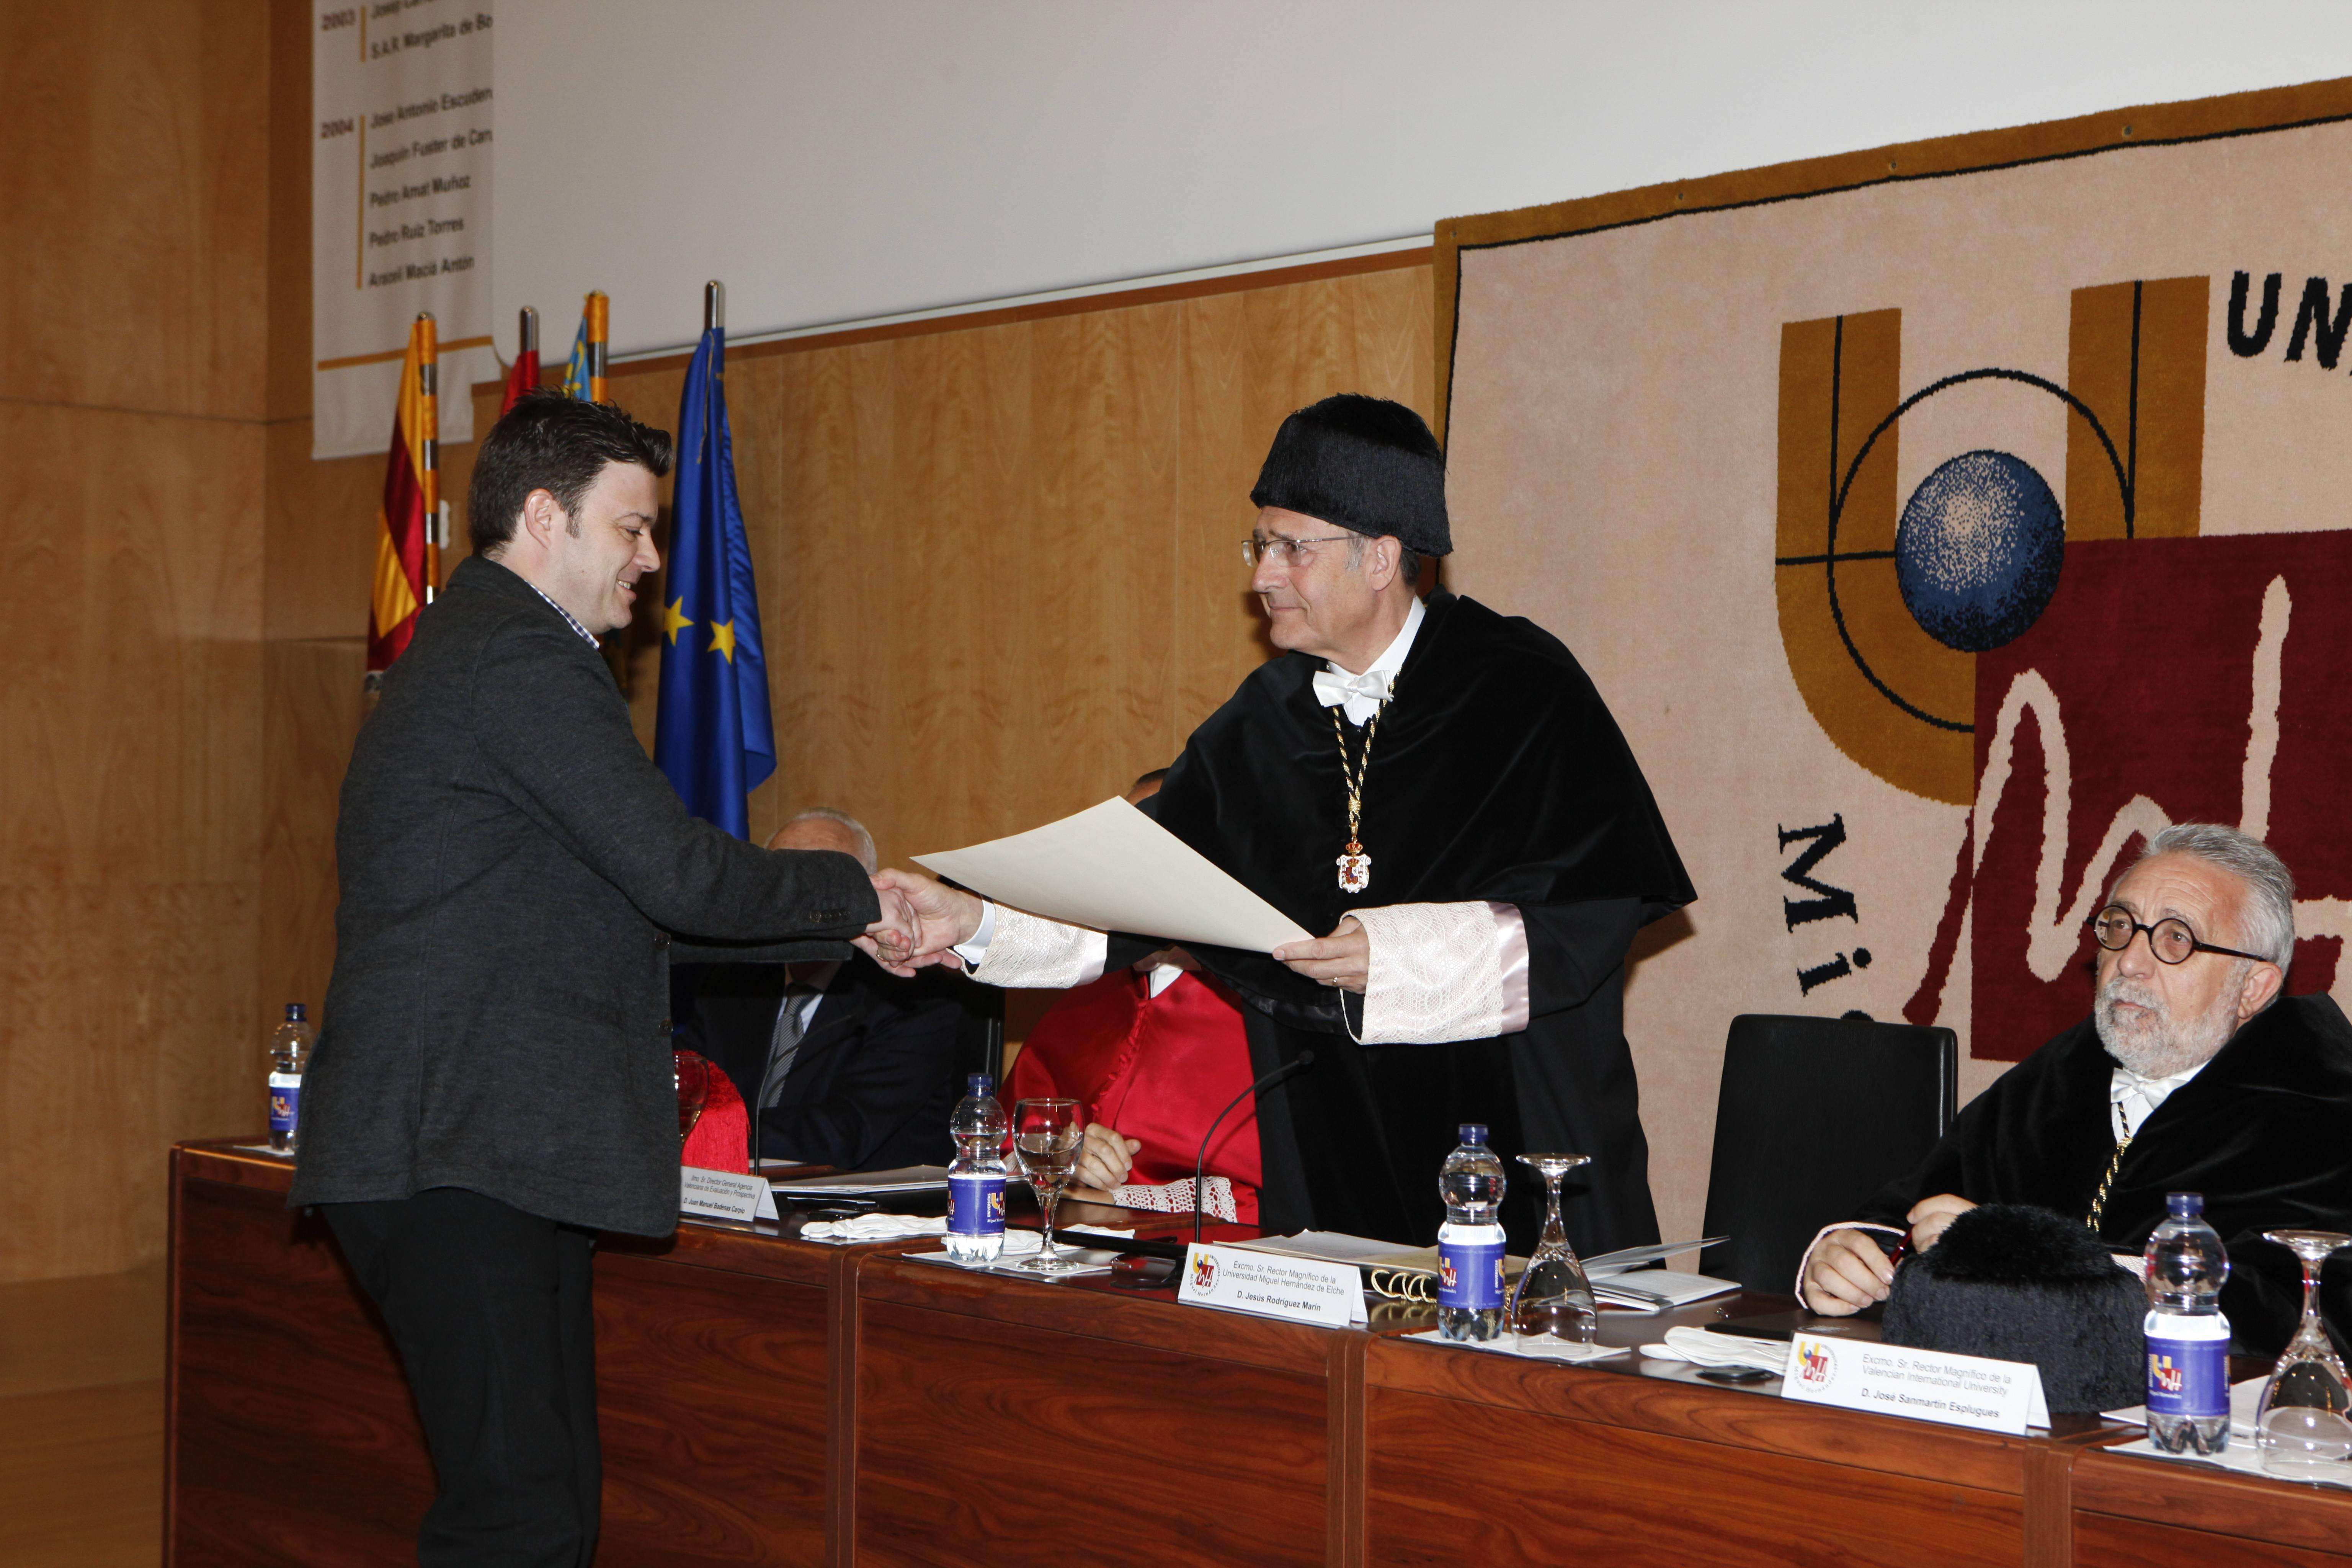 doctor-honoris-causa-luis-gamir_mg_1051.jpg